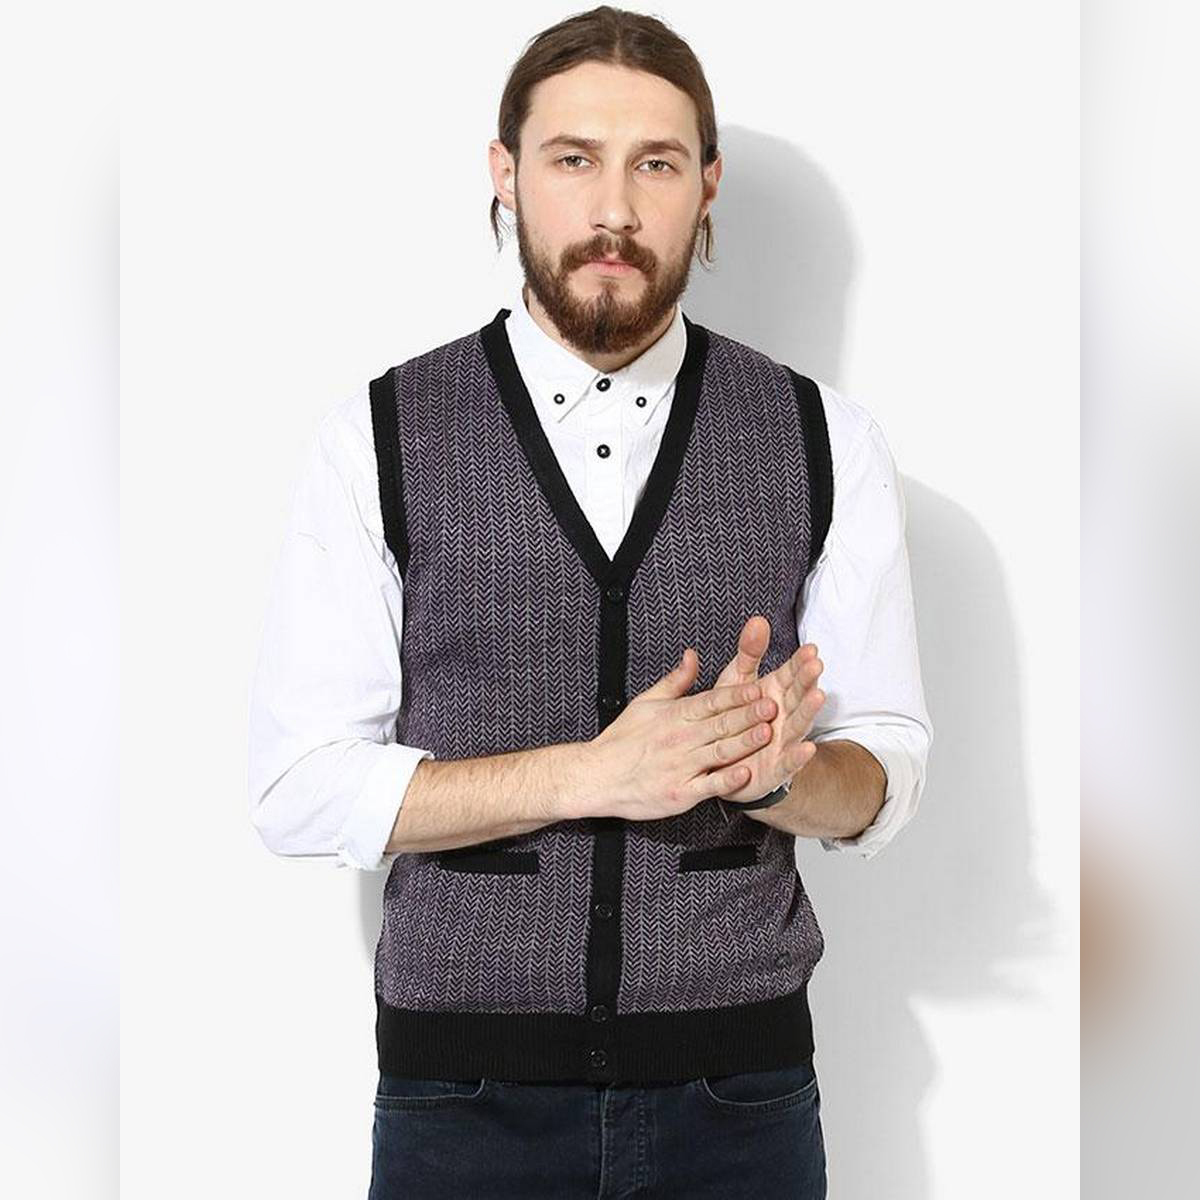 Grey & Black V-Neck Sweater for Men